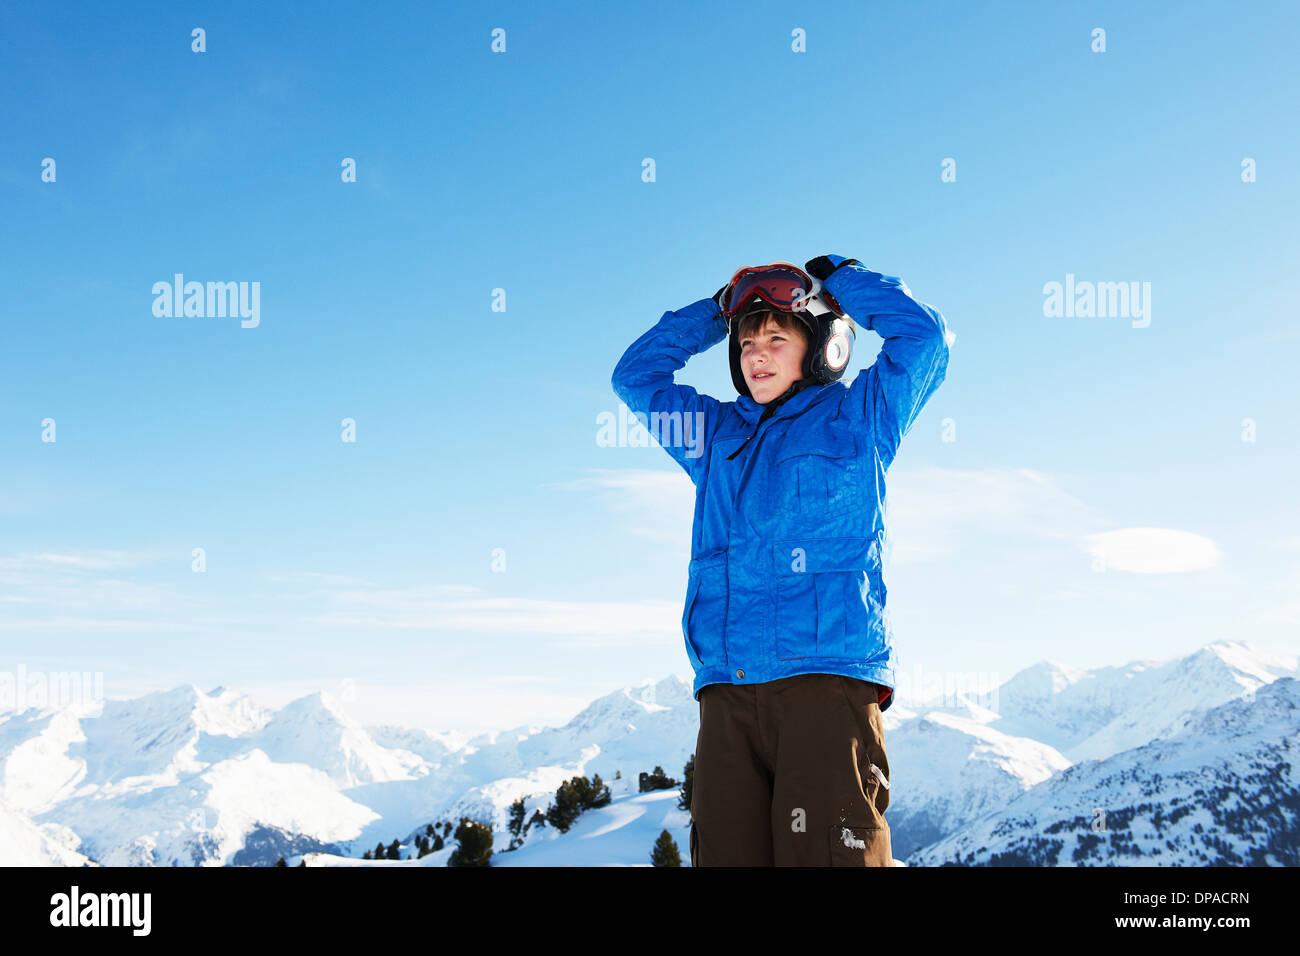 Portrait of boy with hands on head, Les Arcs, Haute-Savoie, France - Stock Image